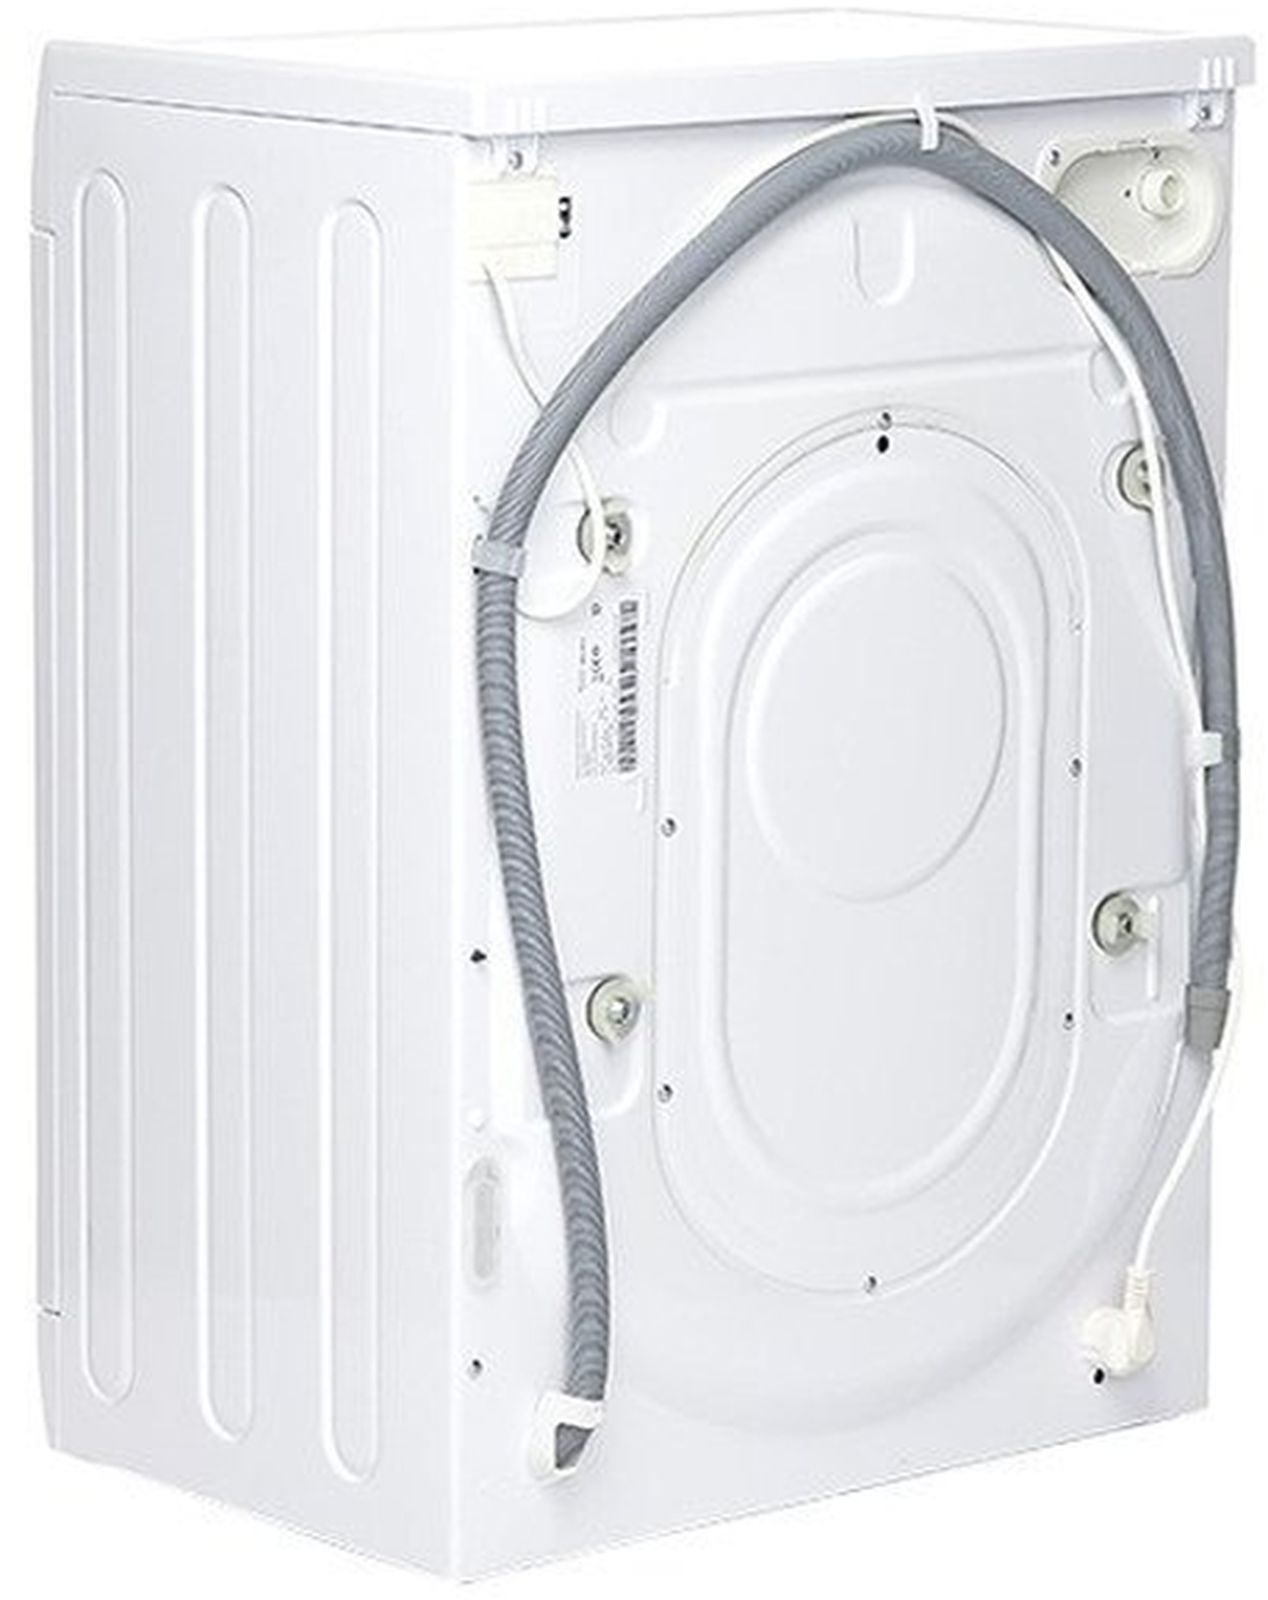 Стиральная машина Hotpoint-Ariston VMSL 5081 B, 95714, белый Hotpoint-Ariston